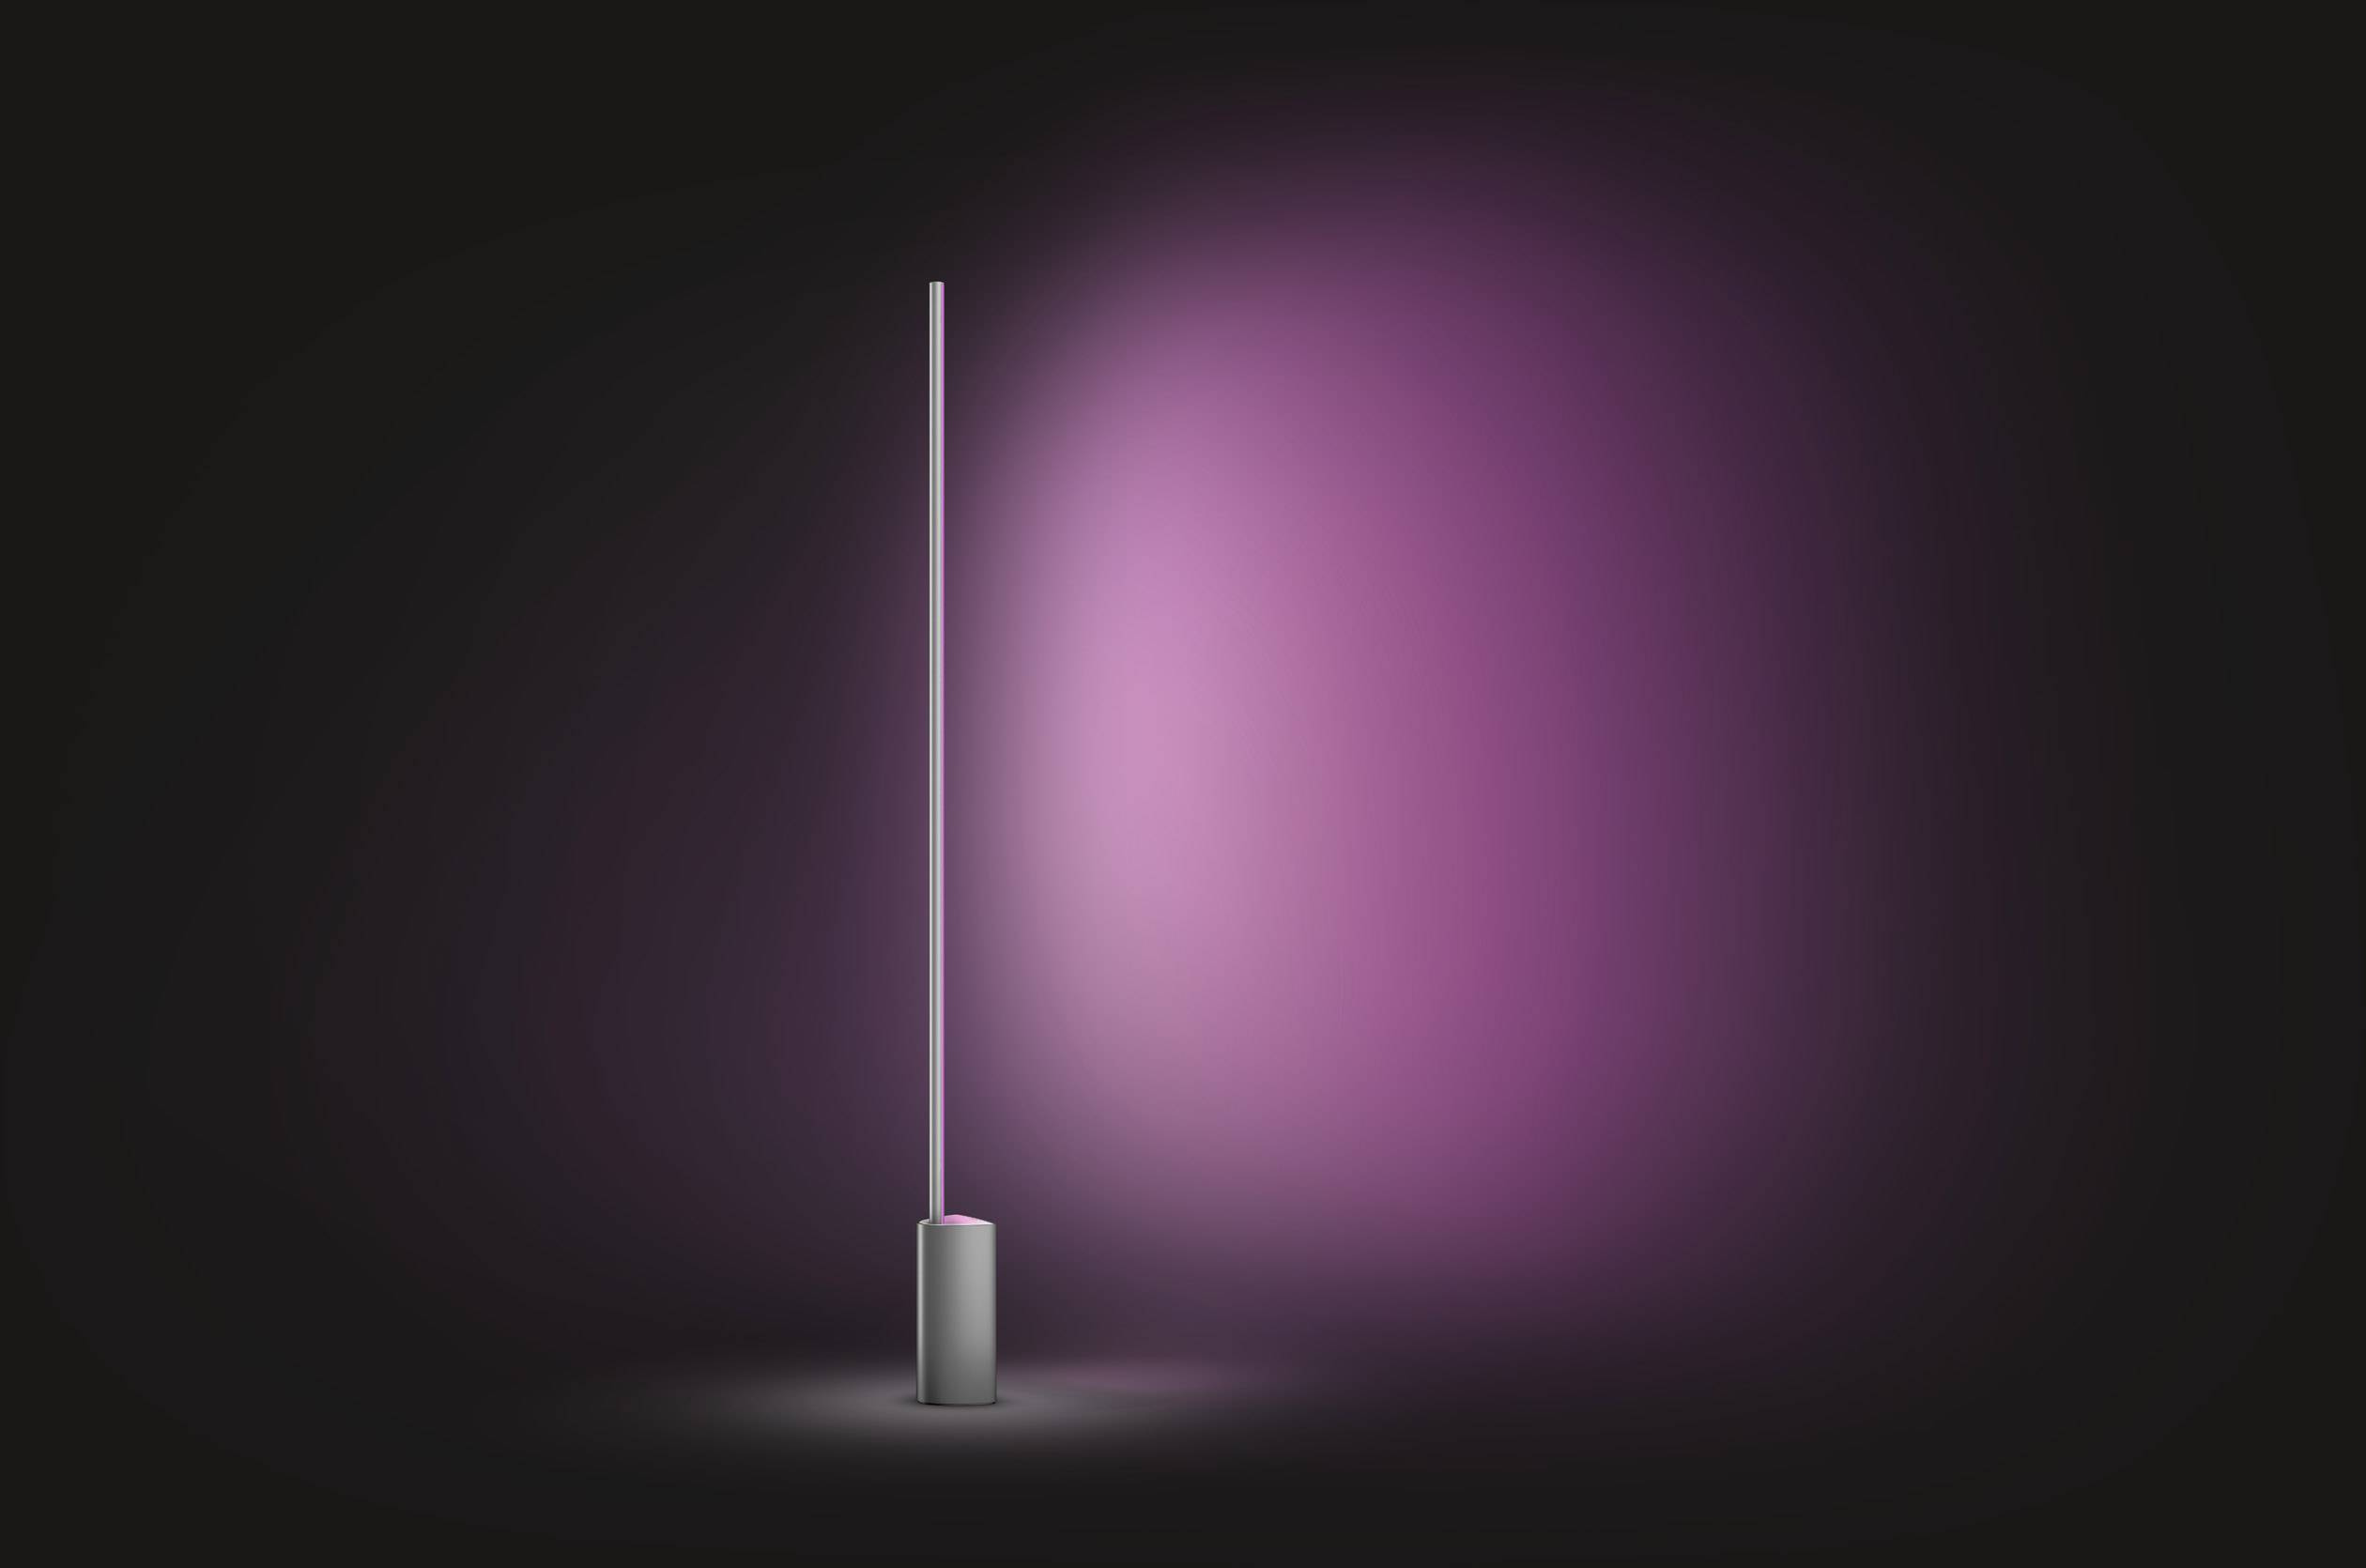 Philips lighting hue lampada a stelo led signe led a montaggio